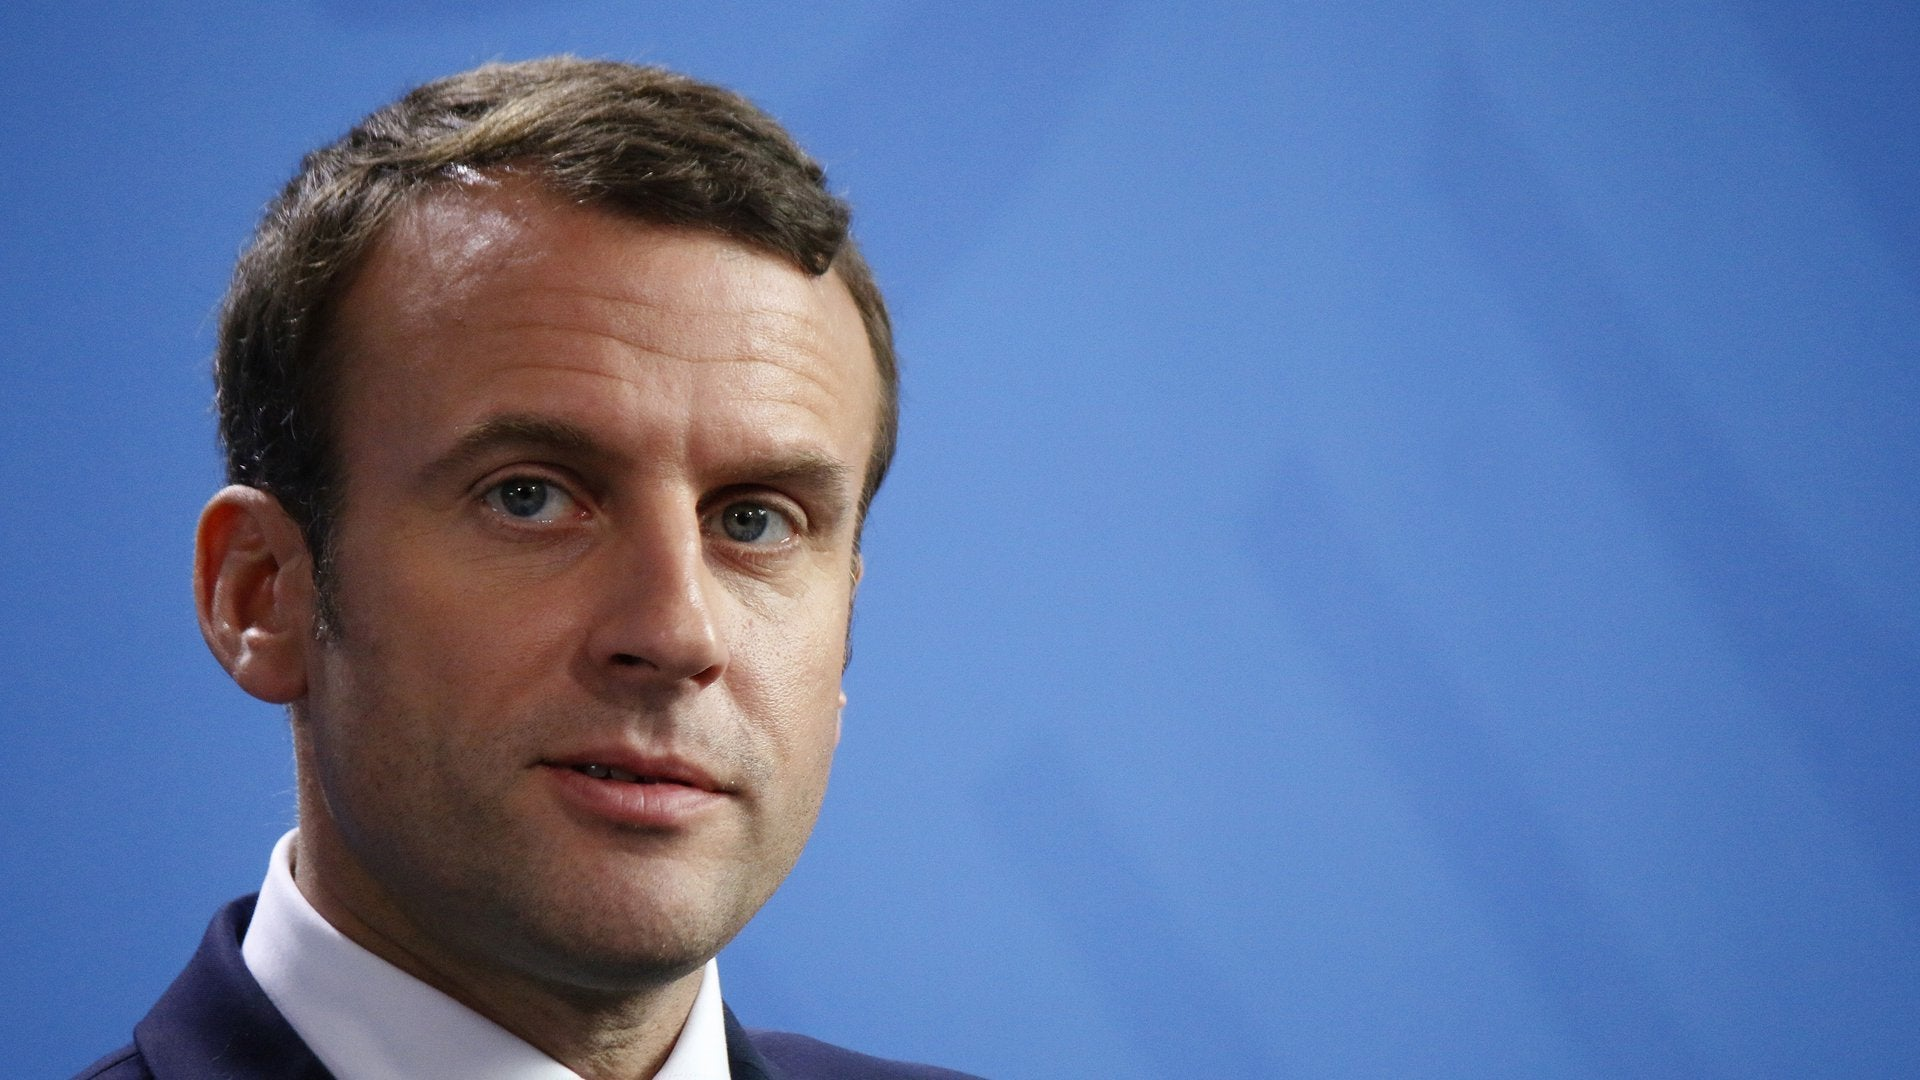 Jupiter: President Macron, France and Europe